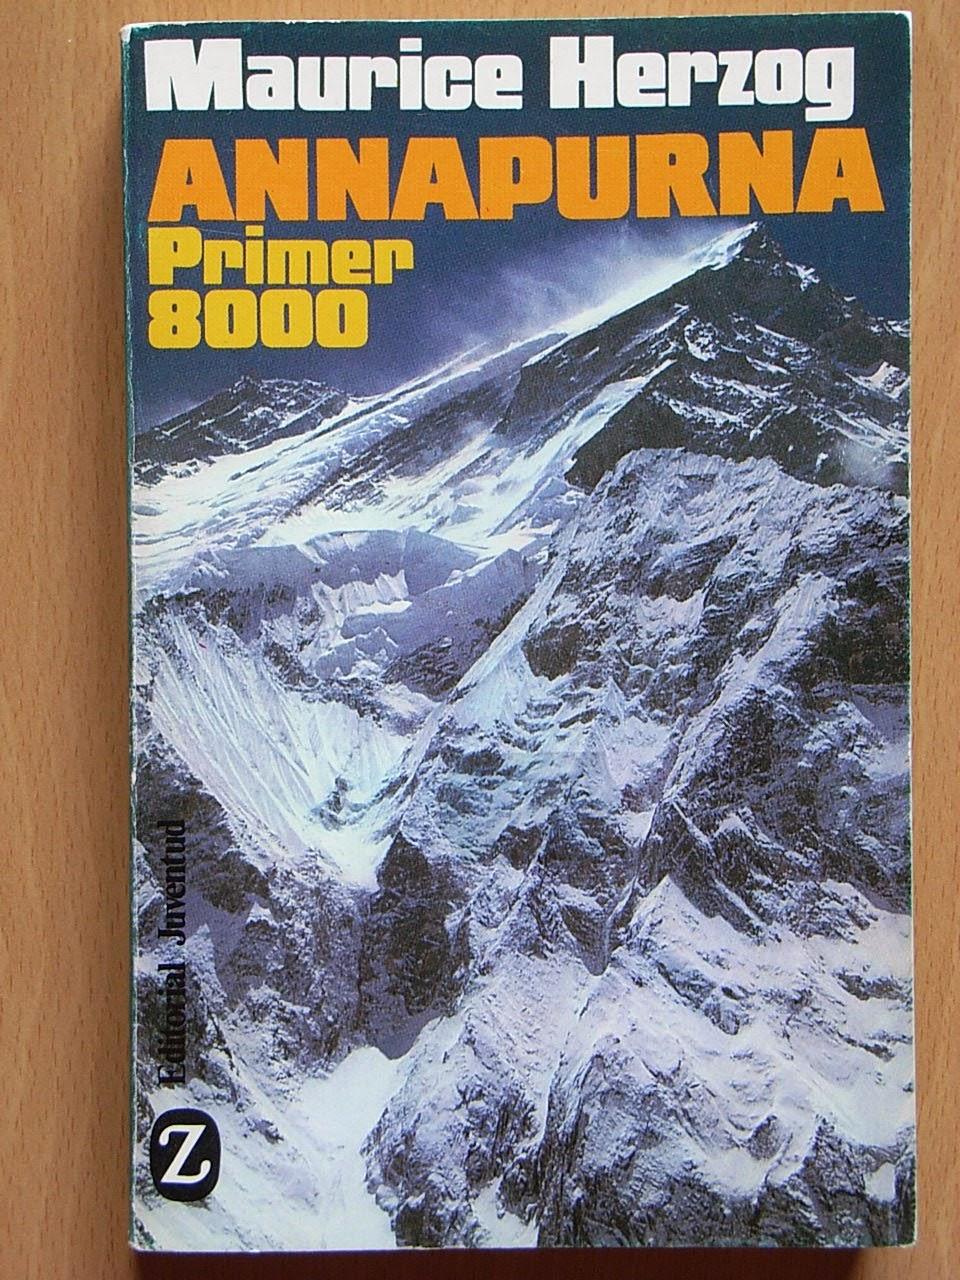 jarban02_pic047: Annapurna, primer 8.000 de Maurice Herzog